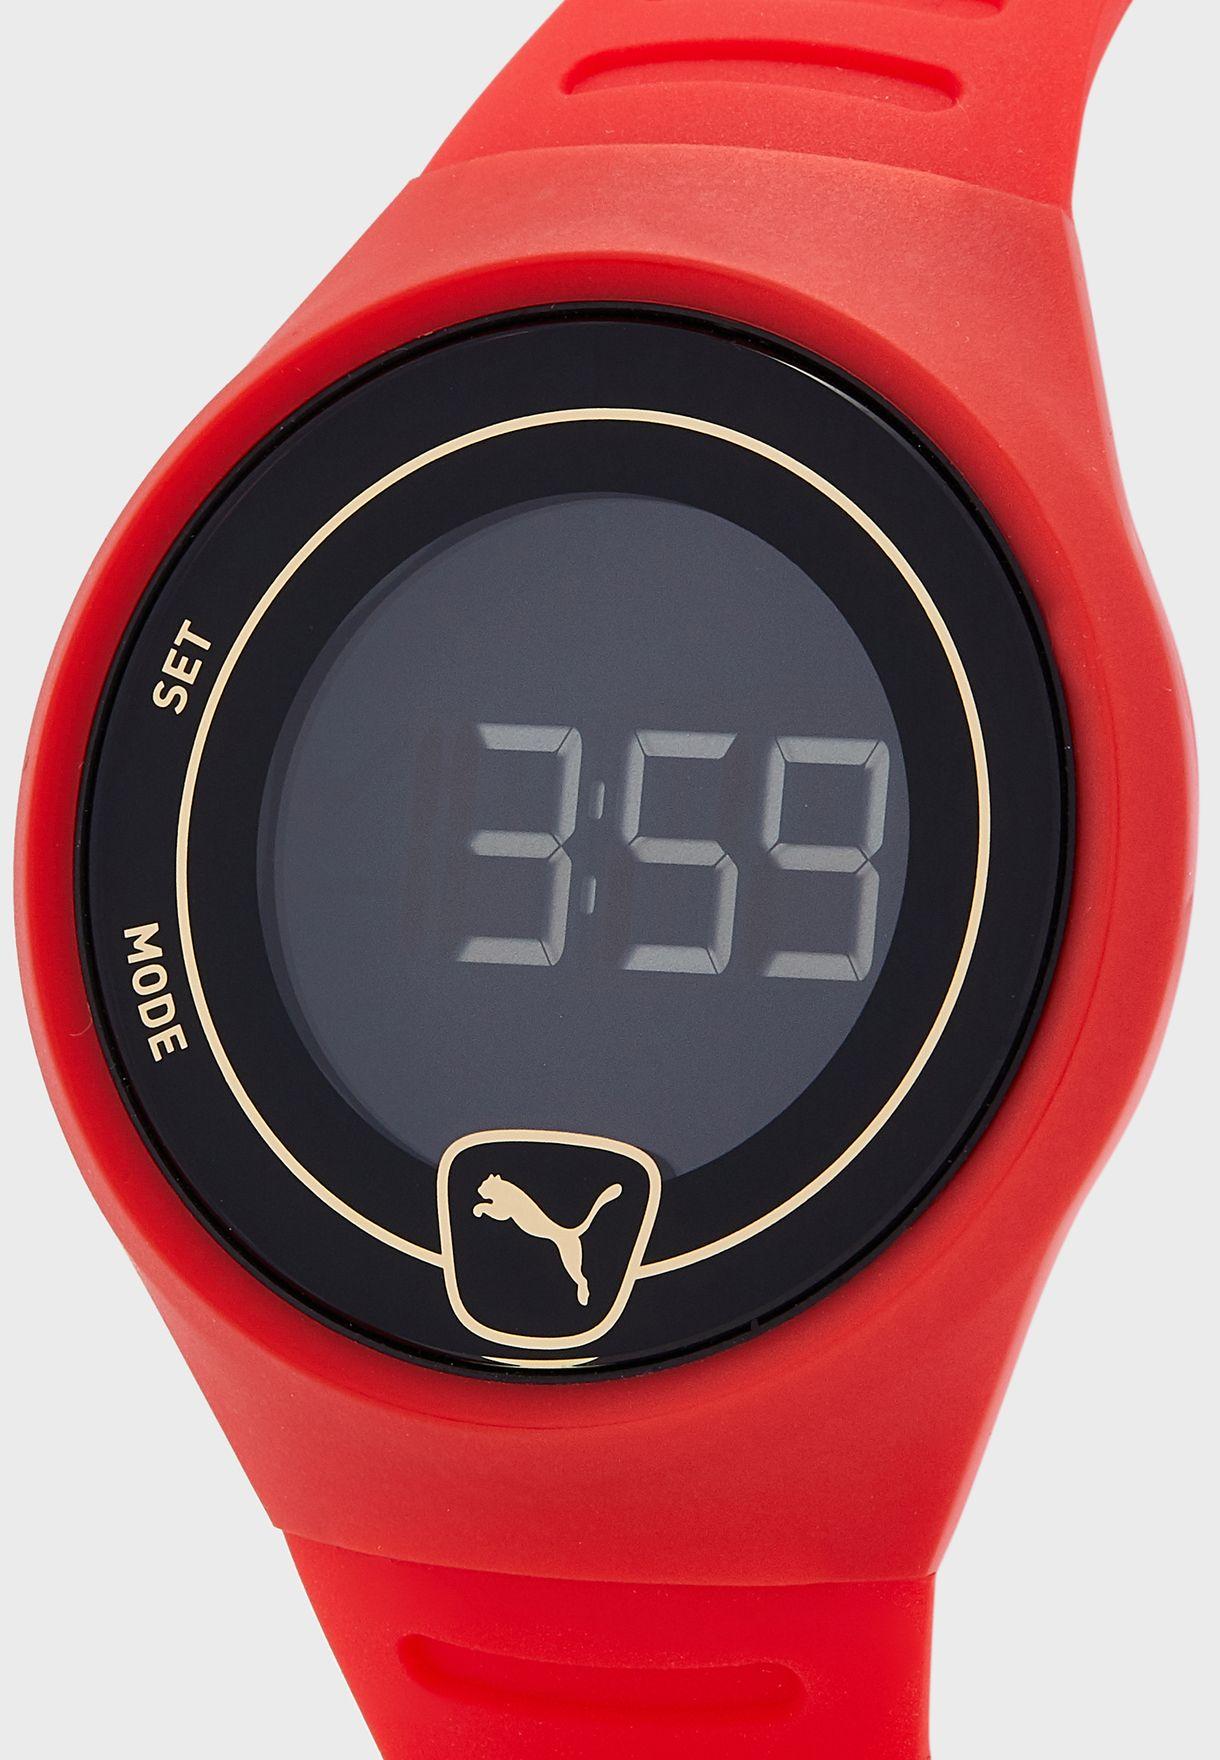 P5047 Digital Watch